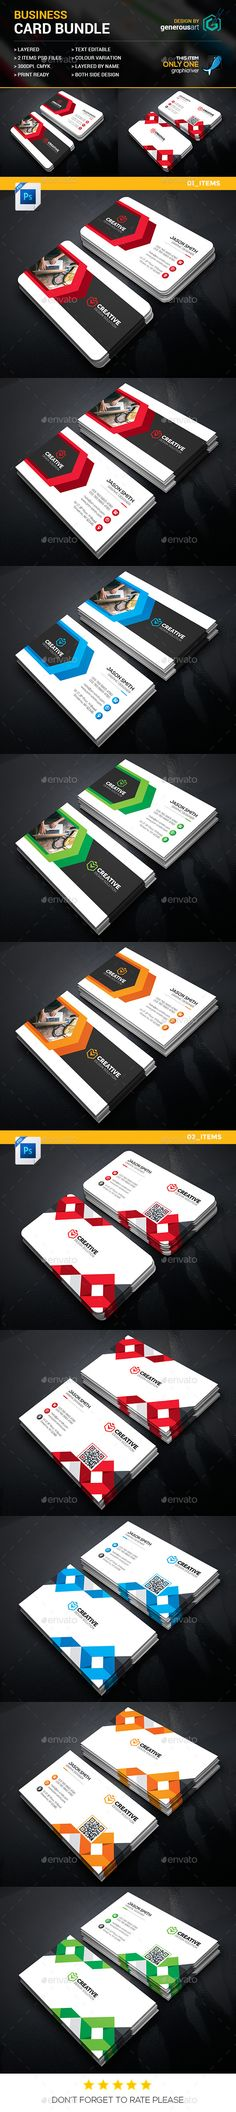 Business Card Templates PSD Bundle. Download here: https://graphicriver.net/item/business-bundle-2-in-1/17550915?ref=ksioks